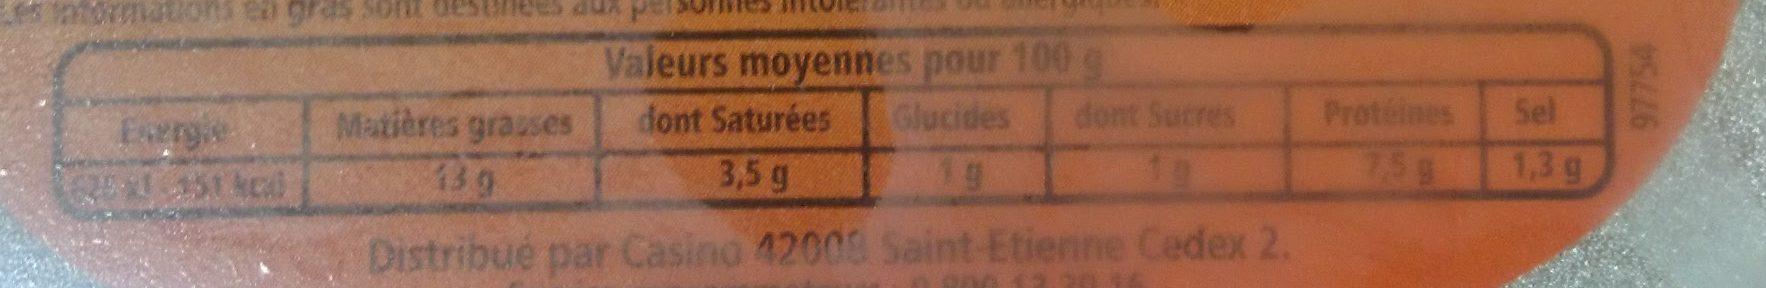 Museau de Porc - Voedingswaarden - fr